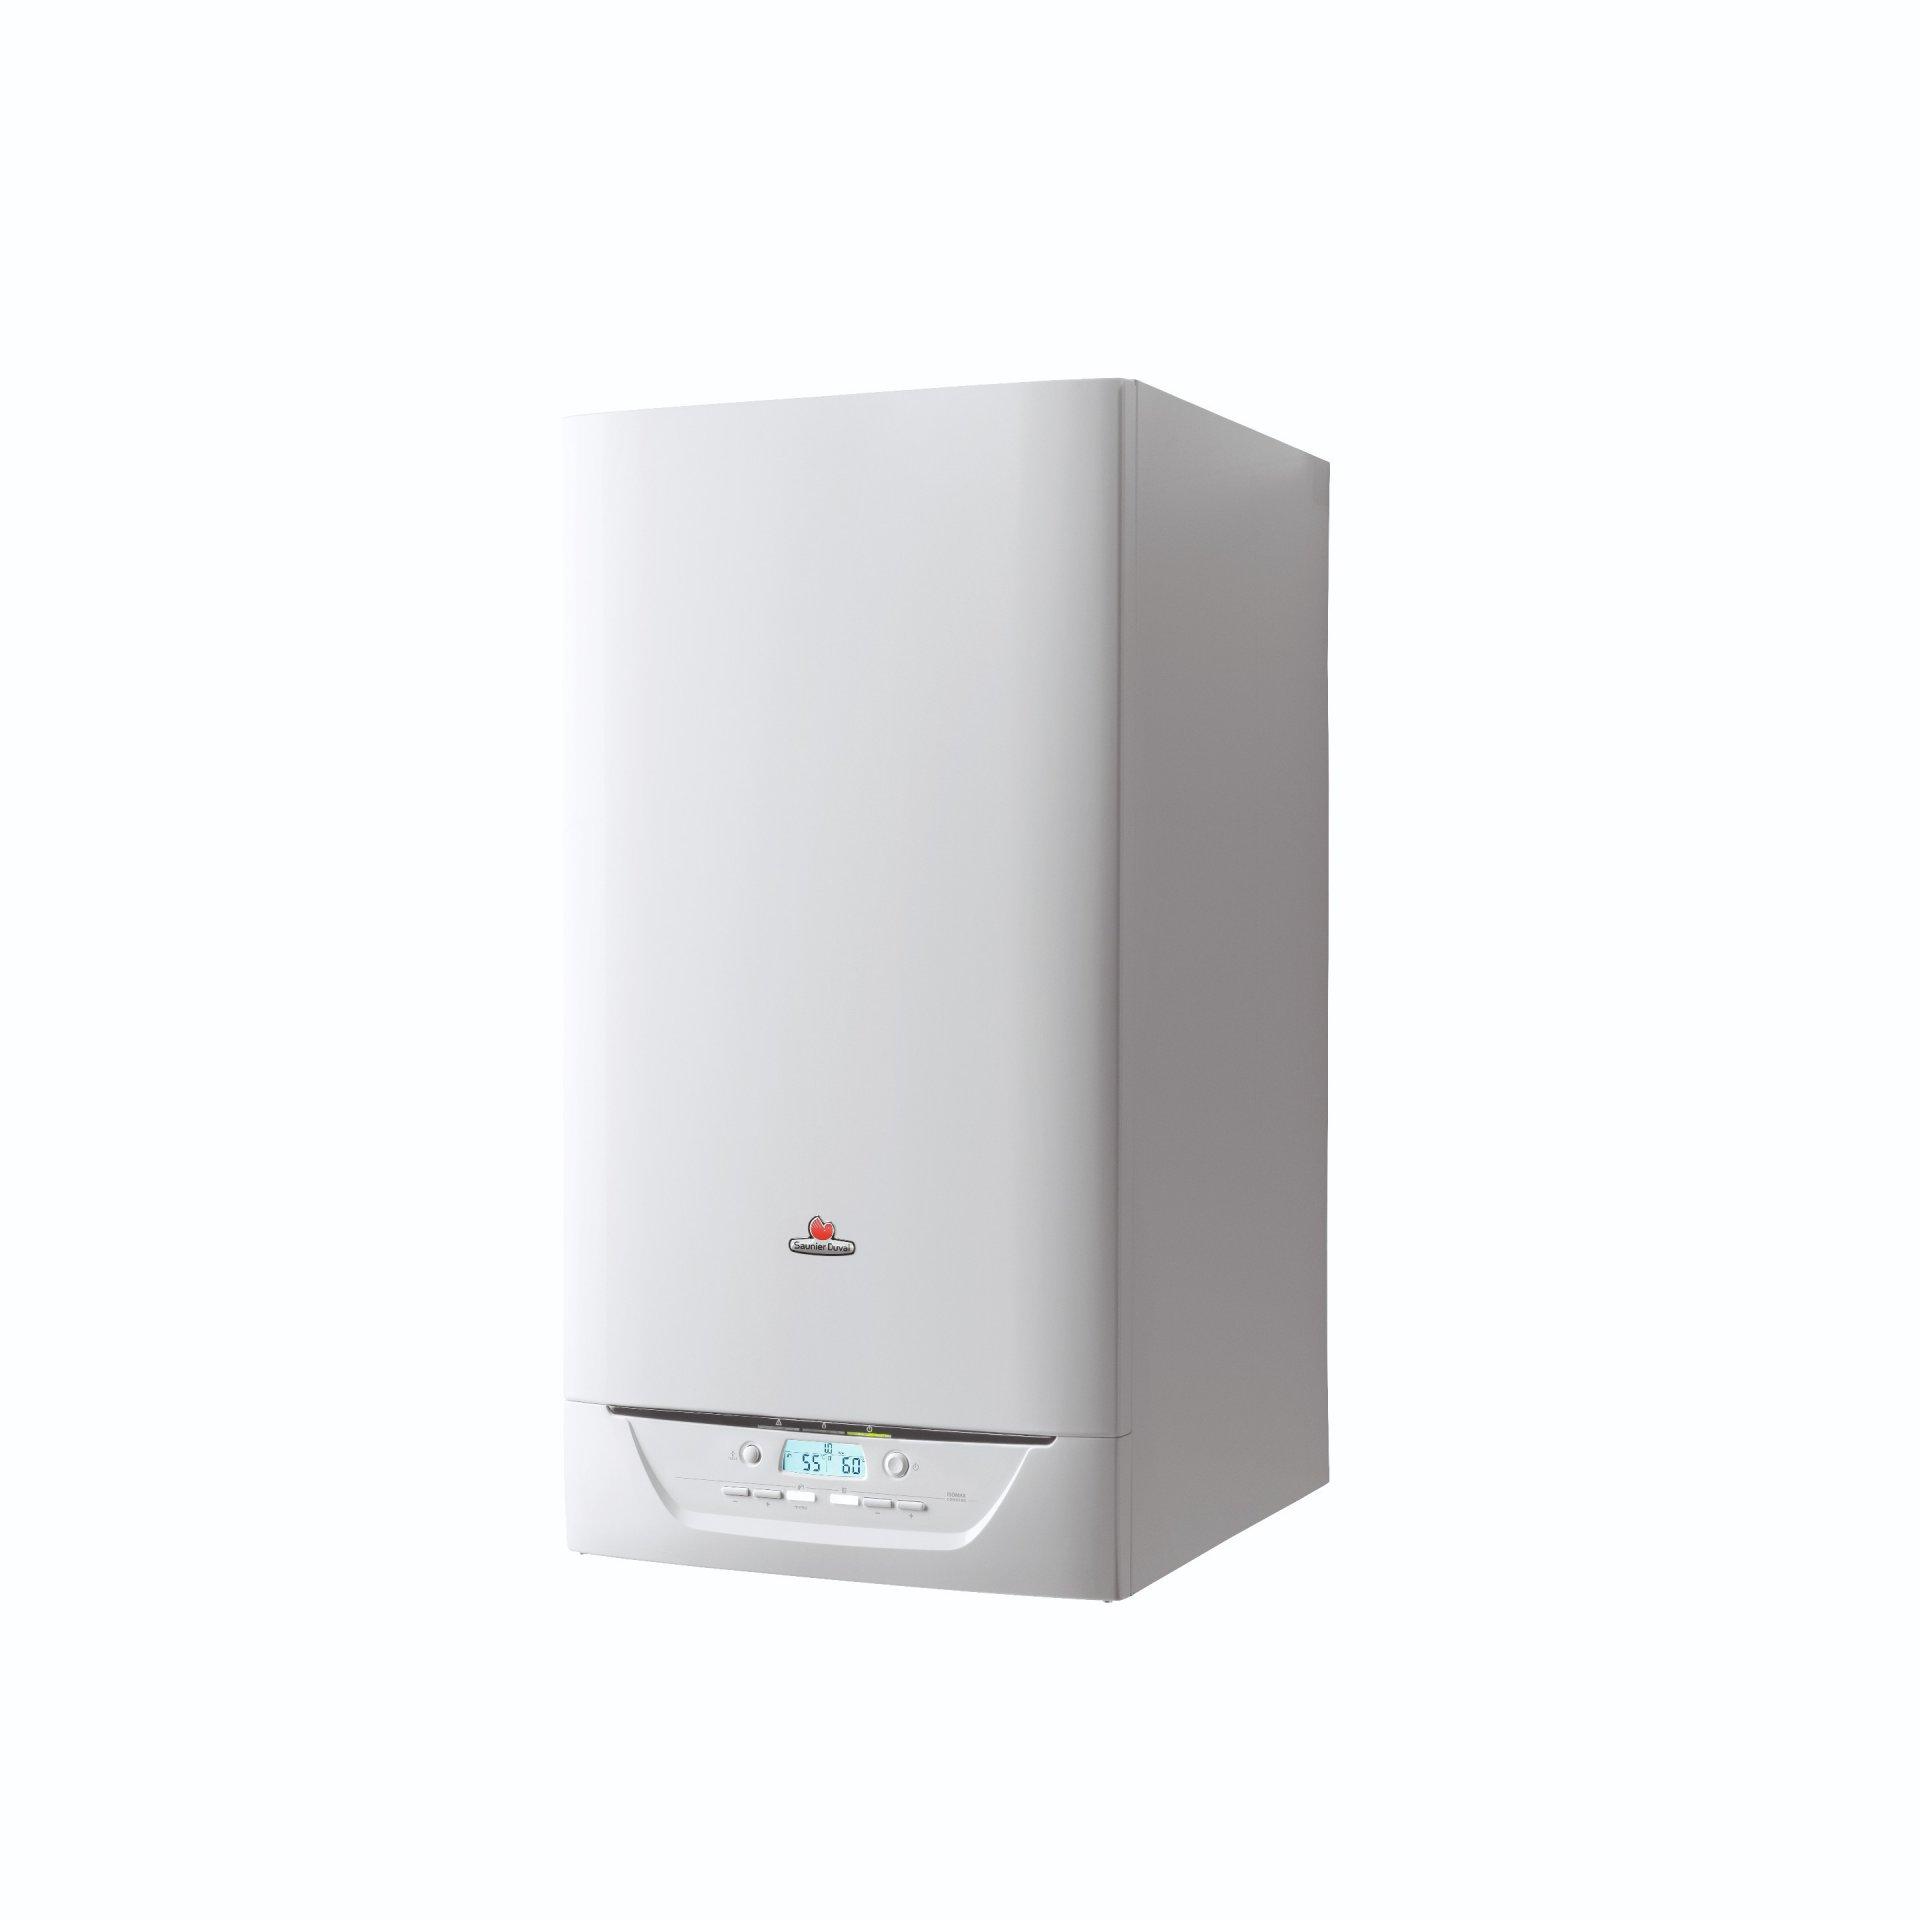 Isomax condens f35 thermogest for Caldera mural mixta